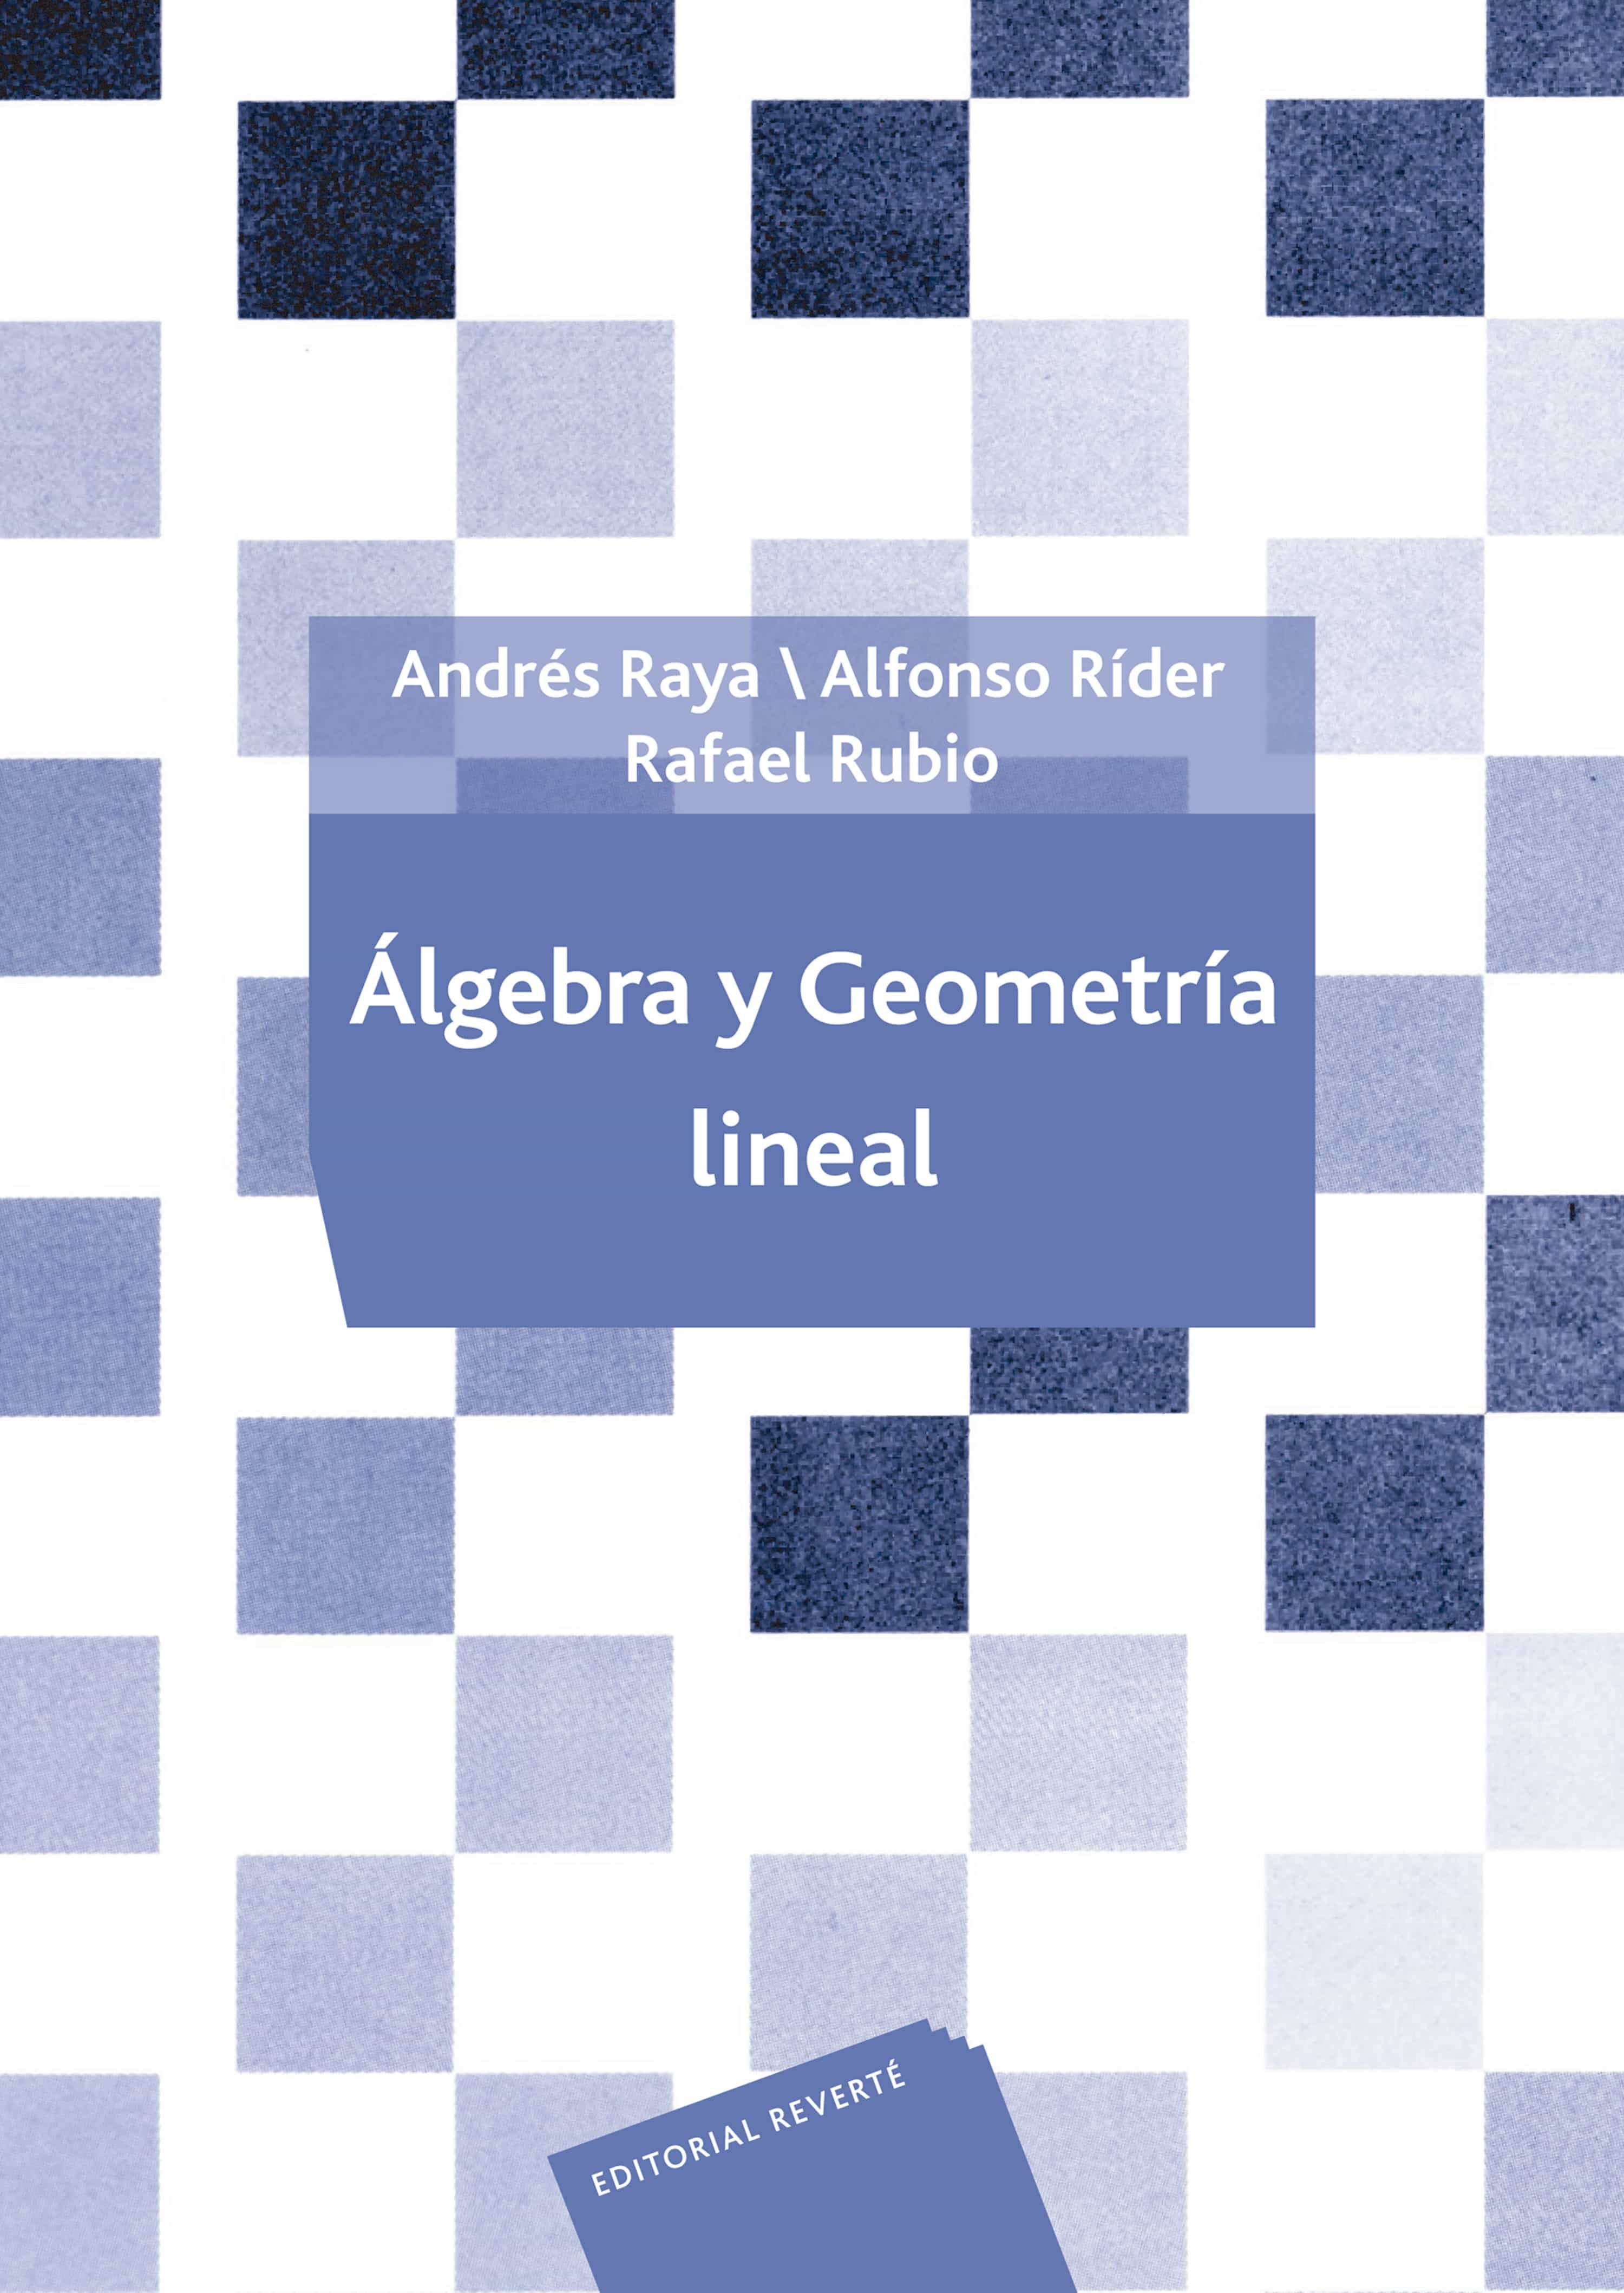 Álgebra Y Geometria Lineal por Andres Raya Saro